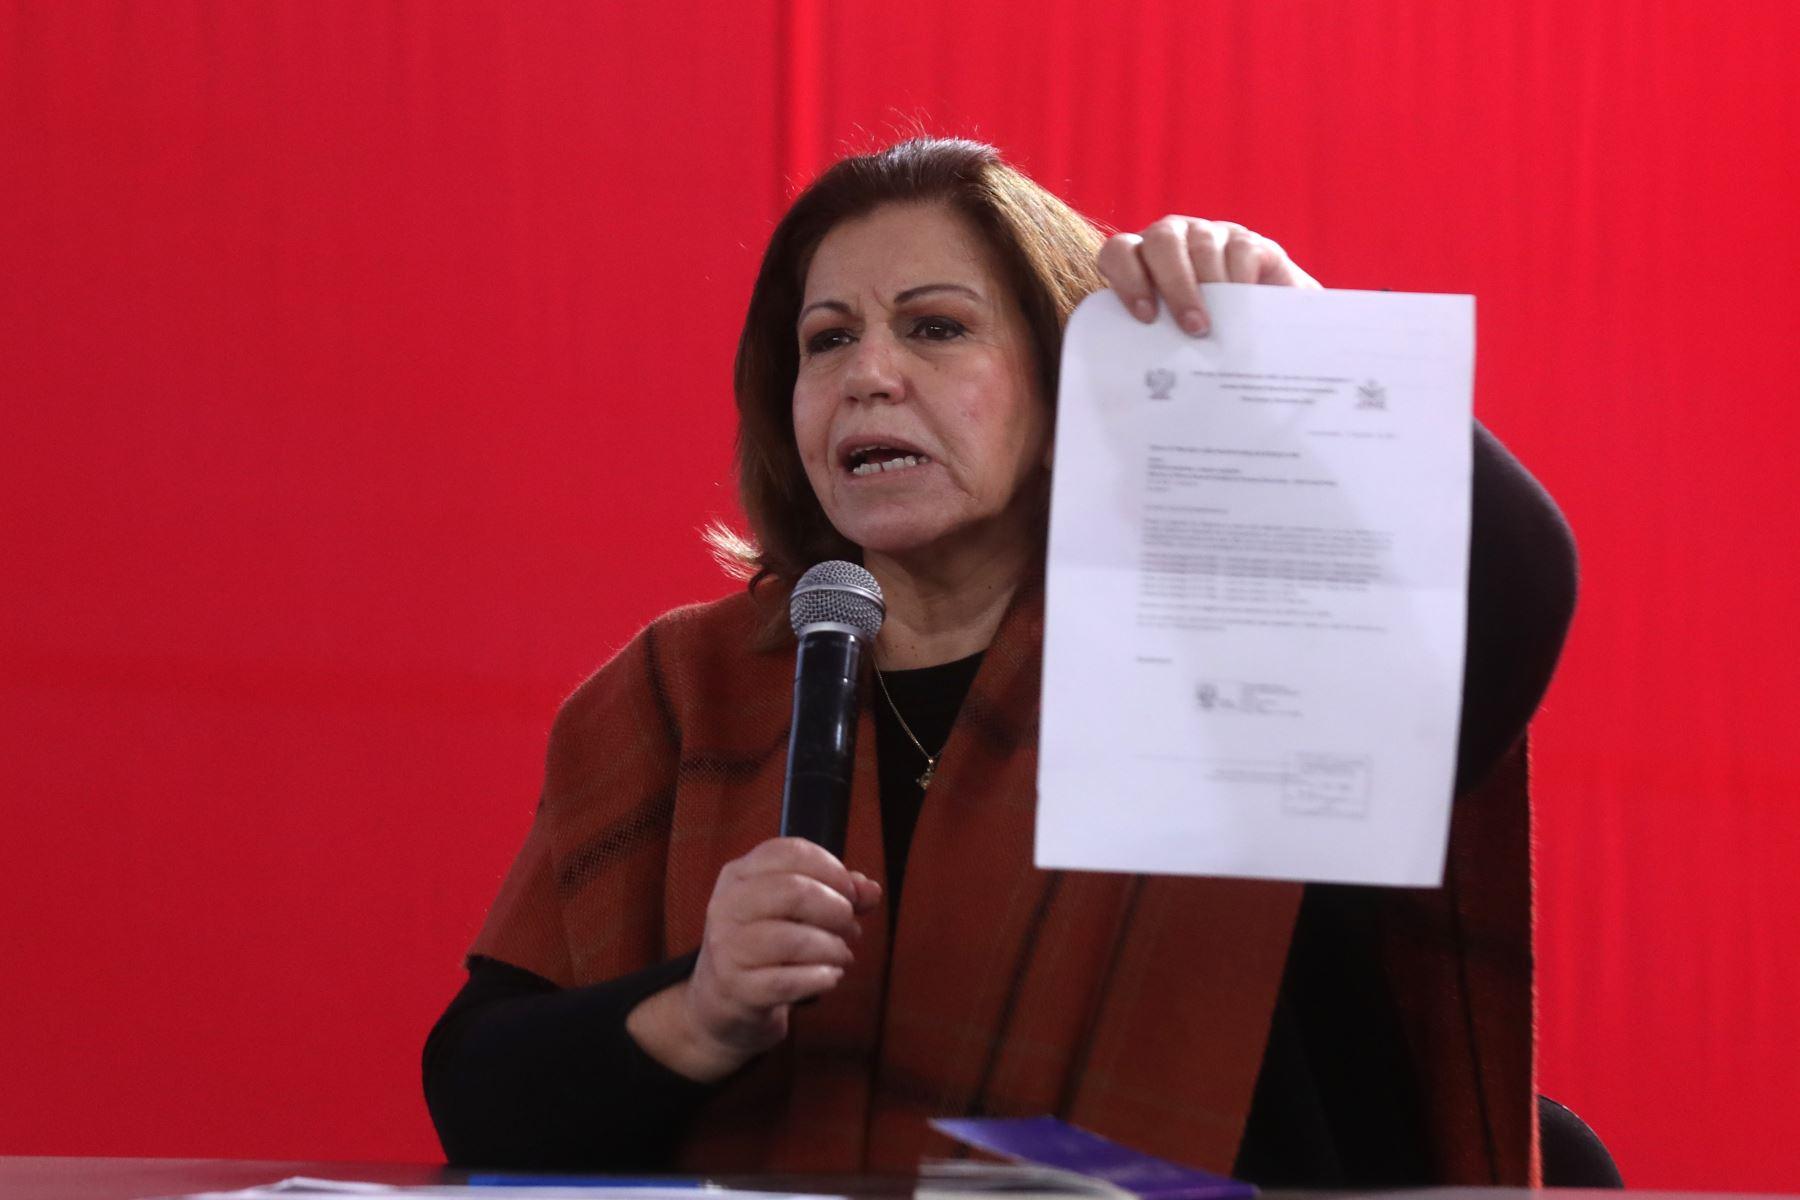 Exlegisladora Lourdes Flores Nano, durante la conferencia de prensa de la candidata a la presidencia, Keiko Fujimori. Foto: ANDINA/ Carla Patiño